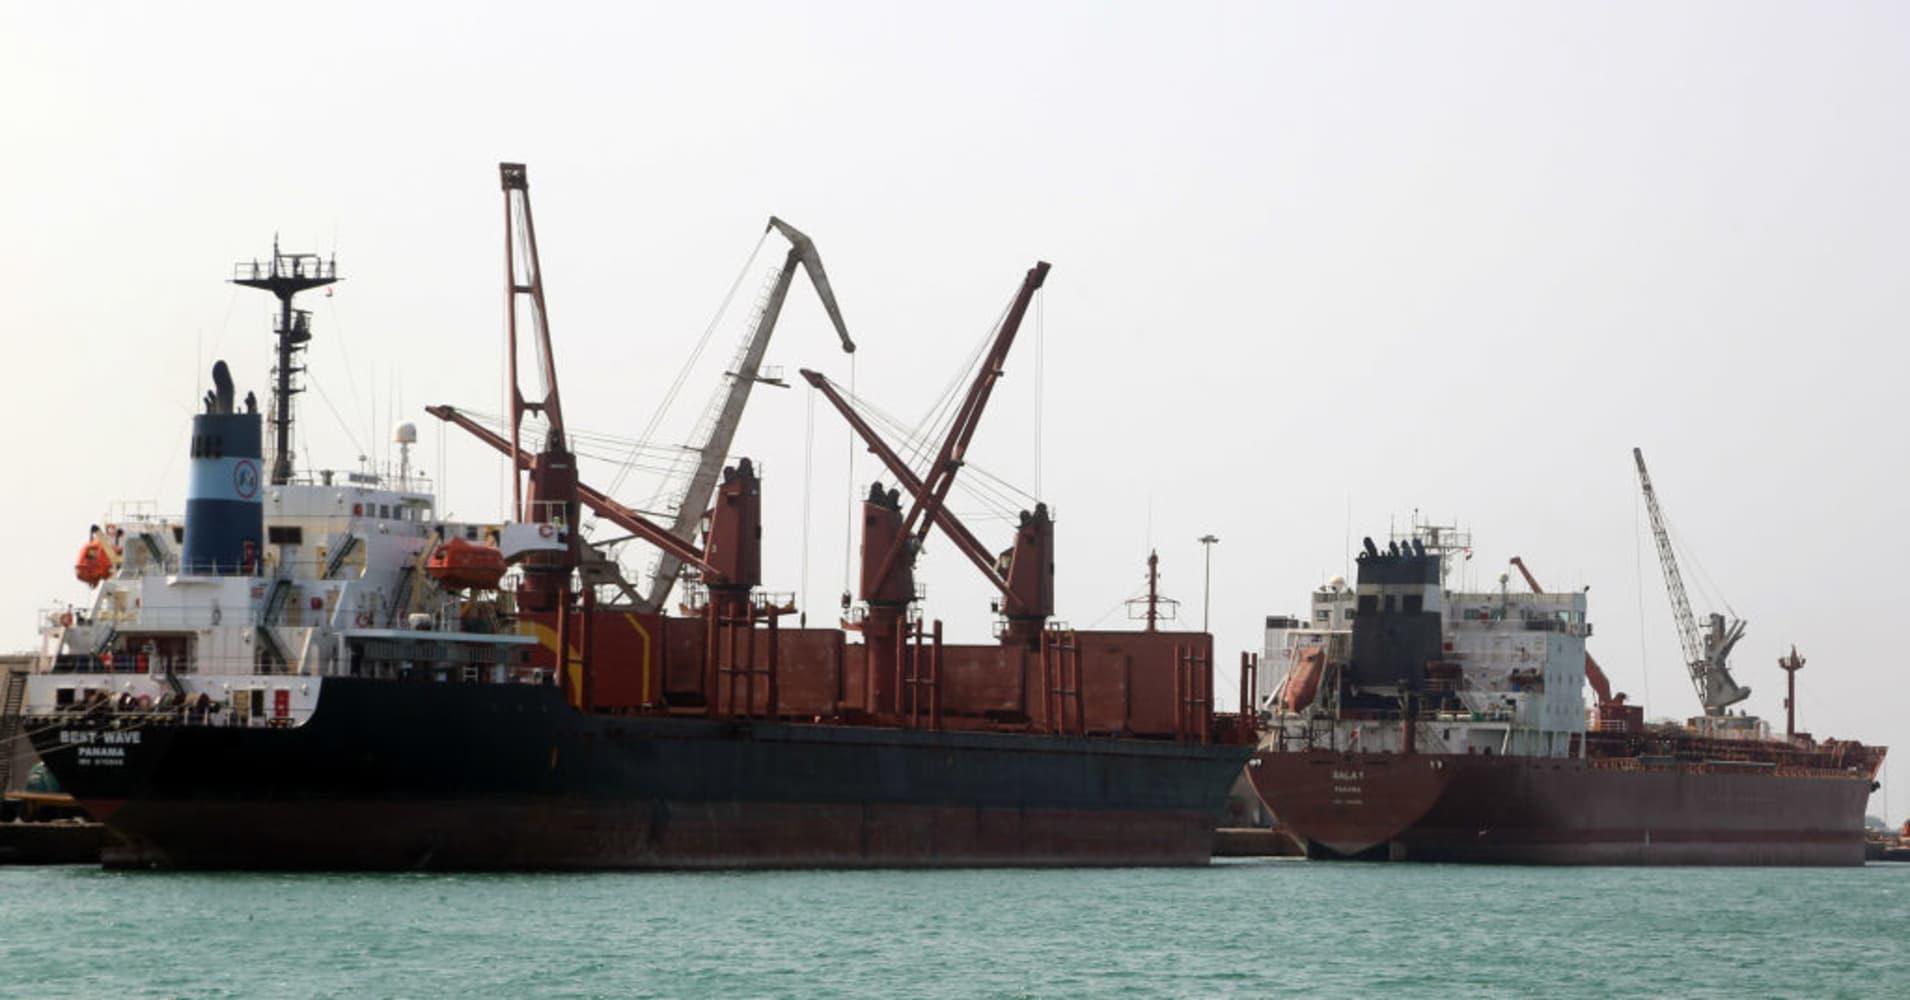 Arab states launch biggest assault of Yemen war with attack on main port